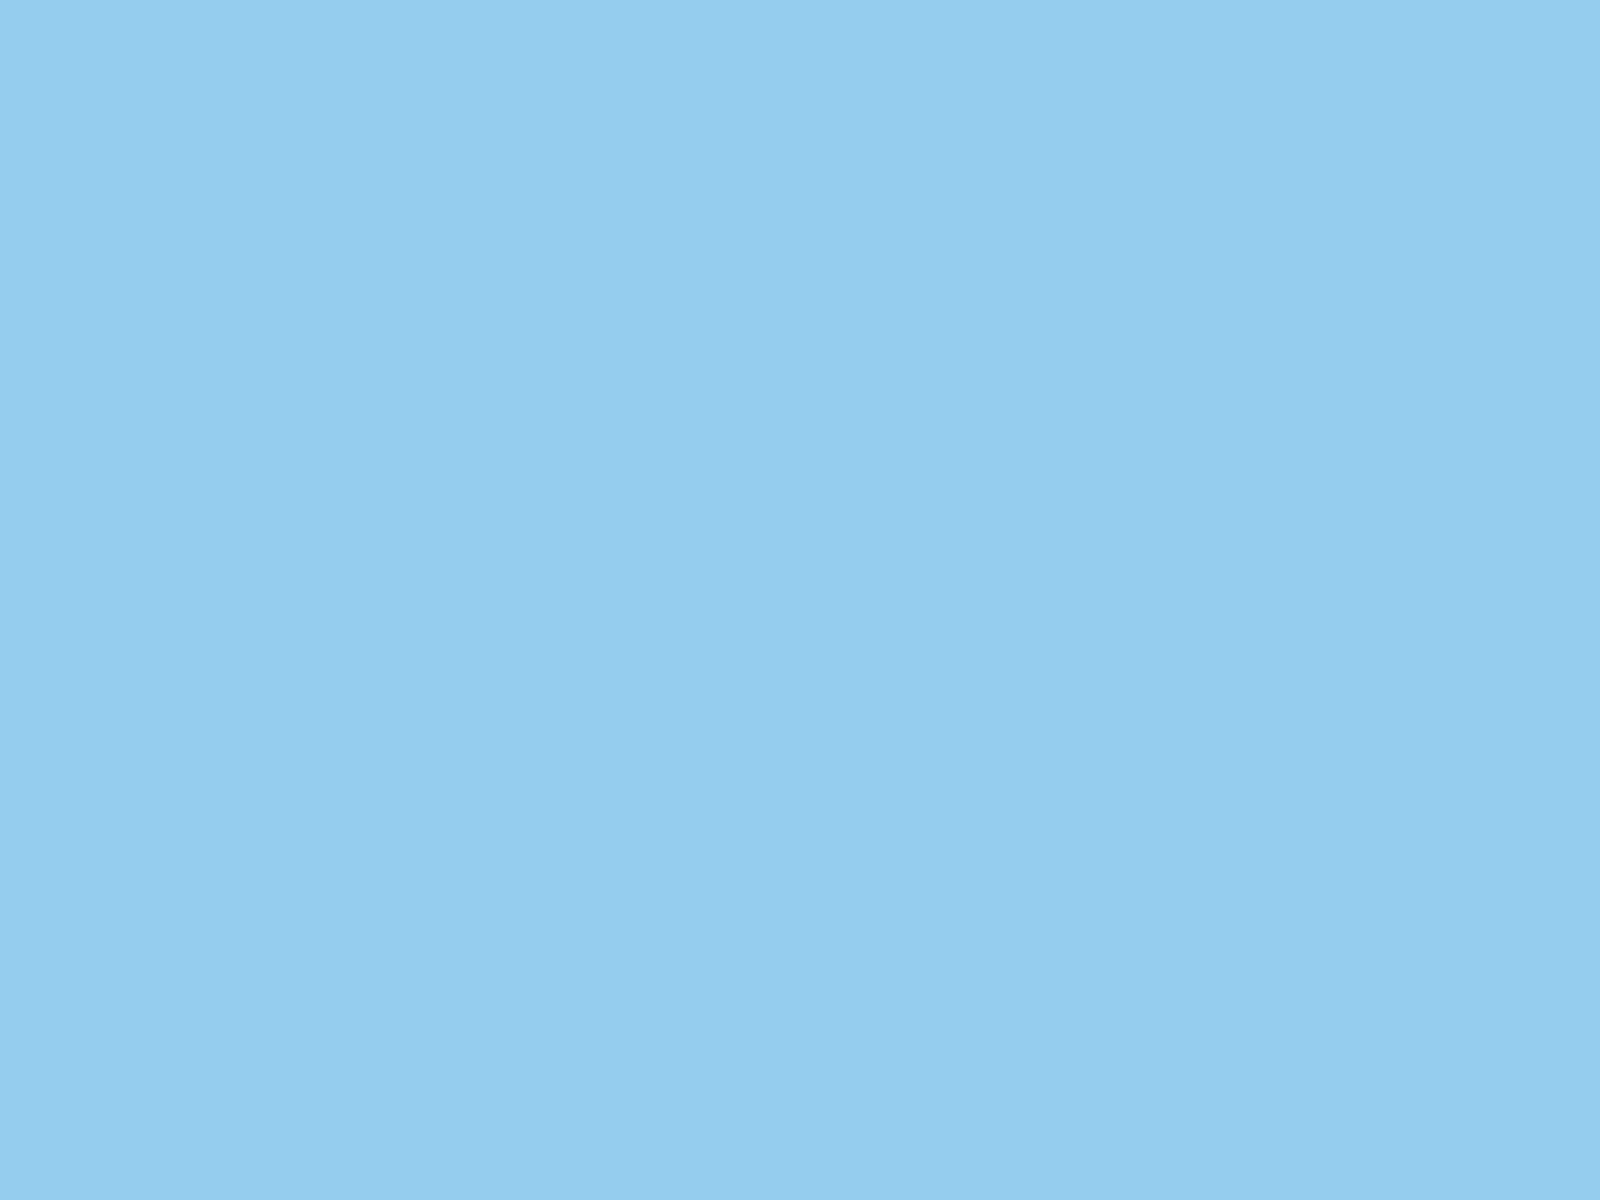 1600x1200 Light Cornflower Blue Solid Color Background